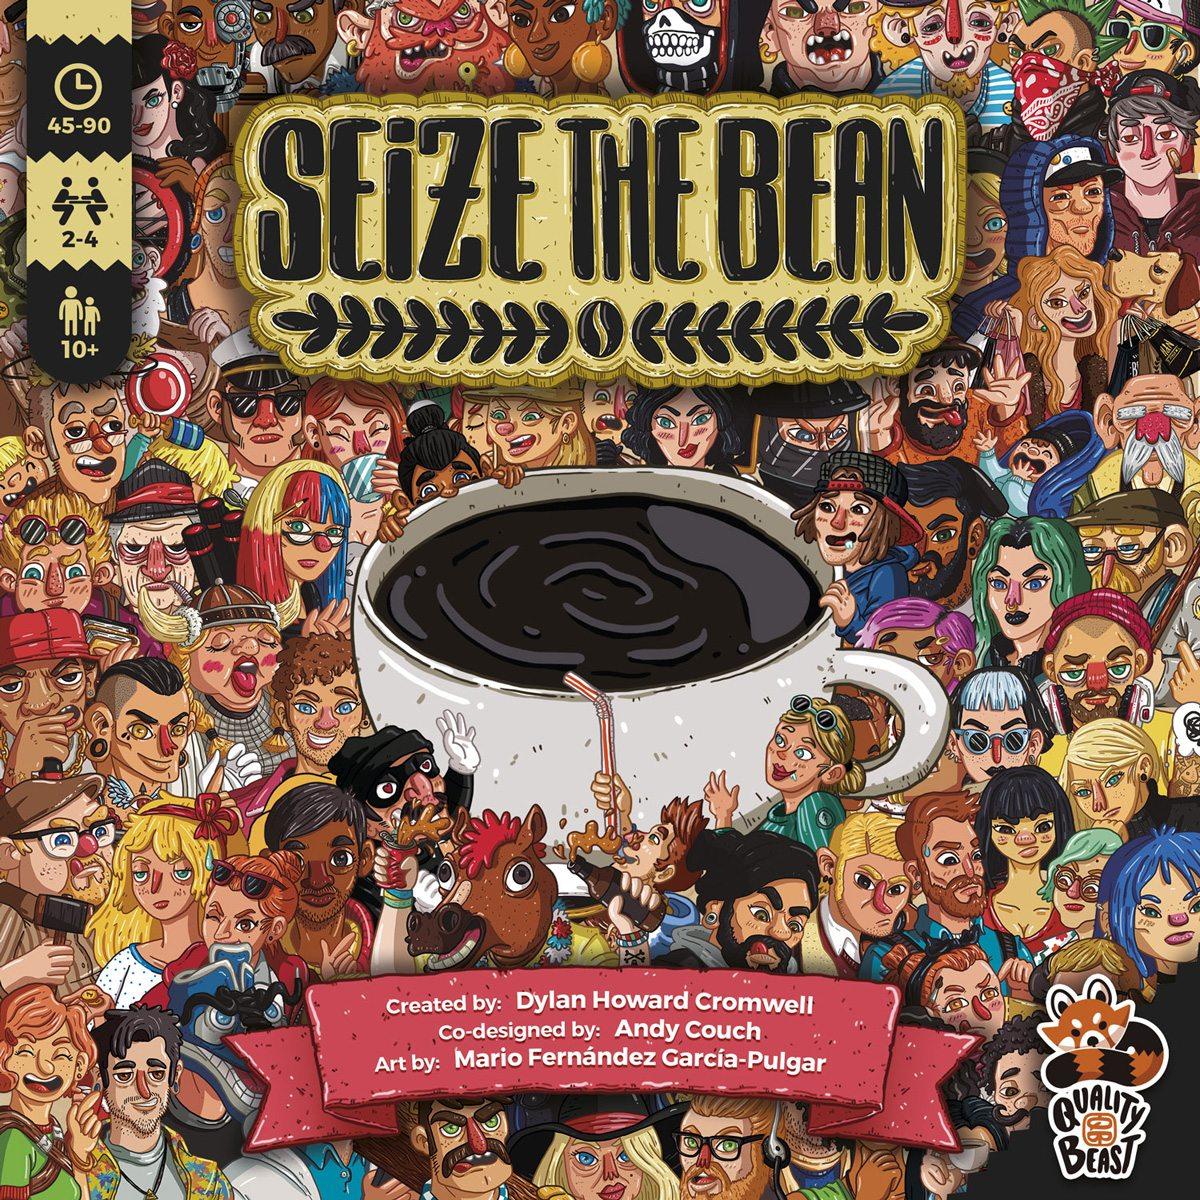 Seize the Bean box cover